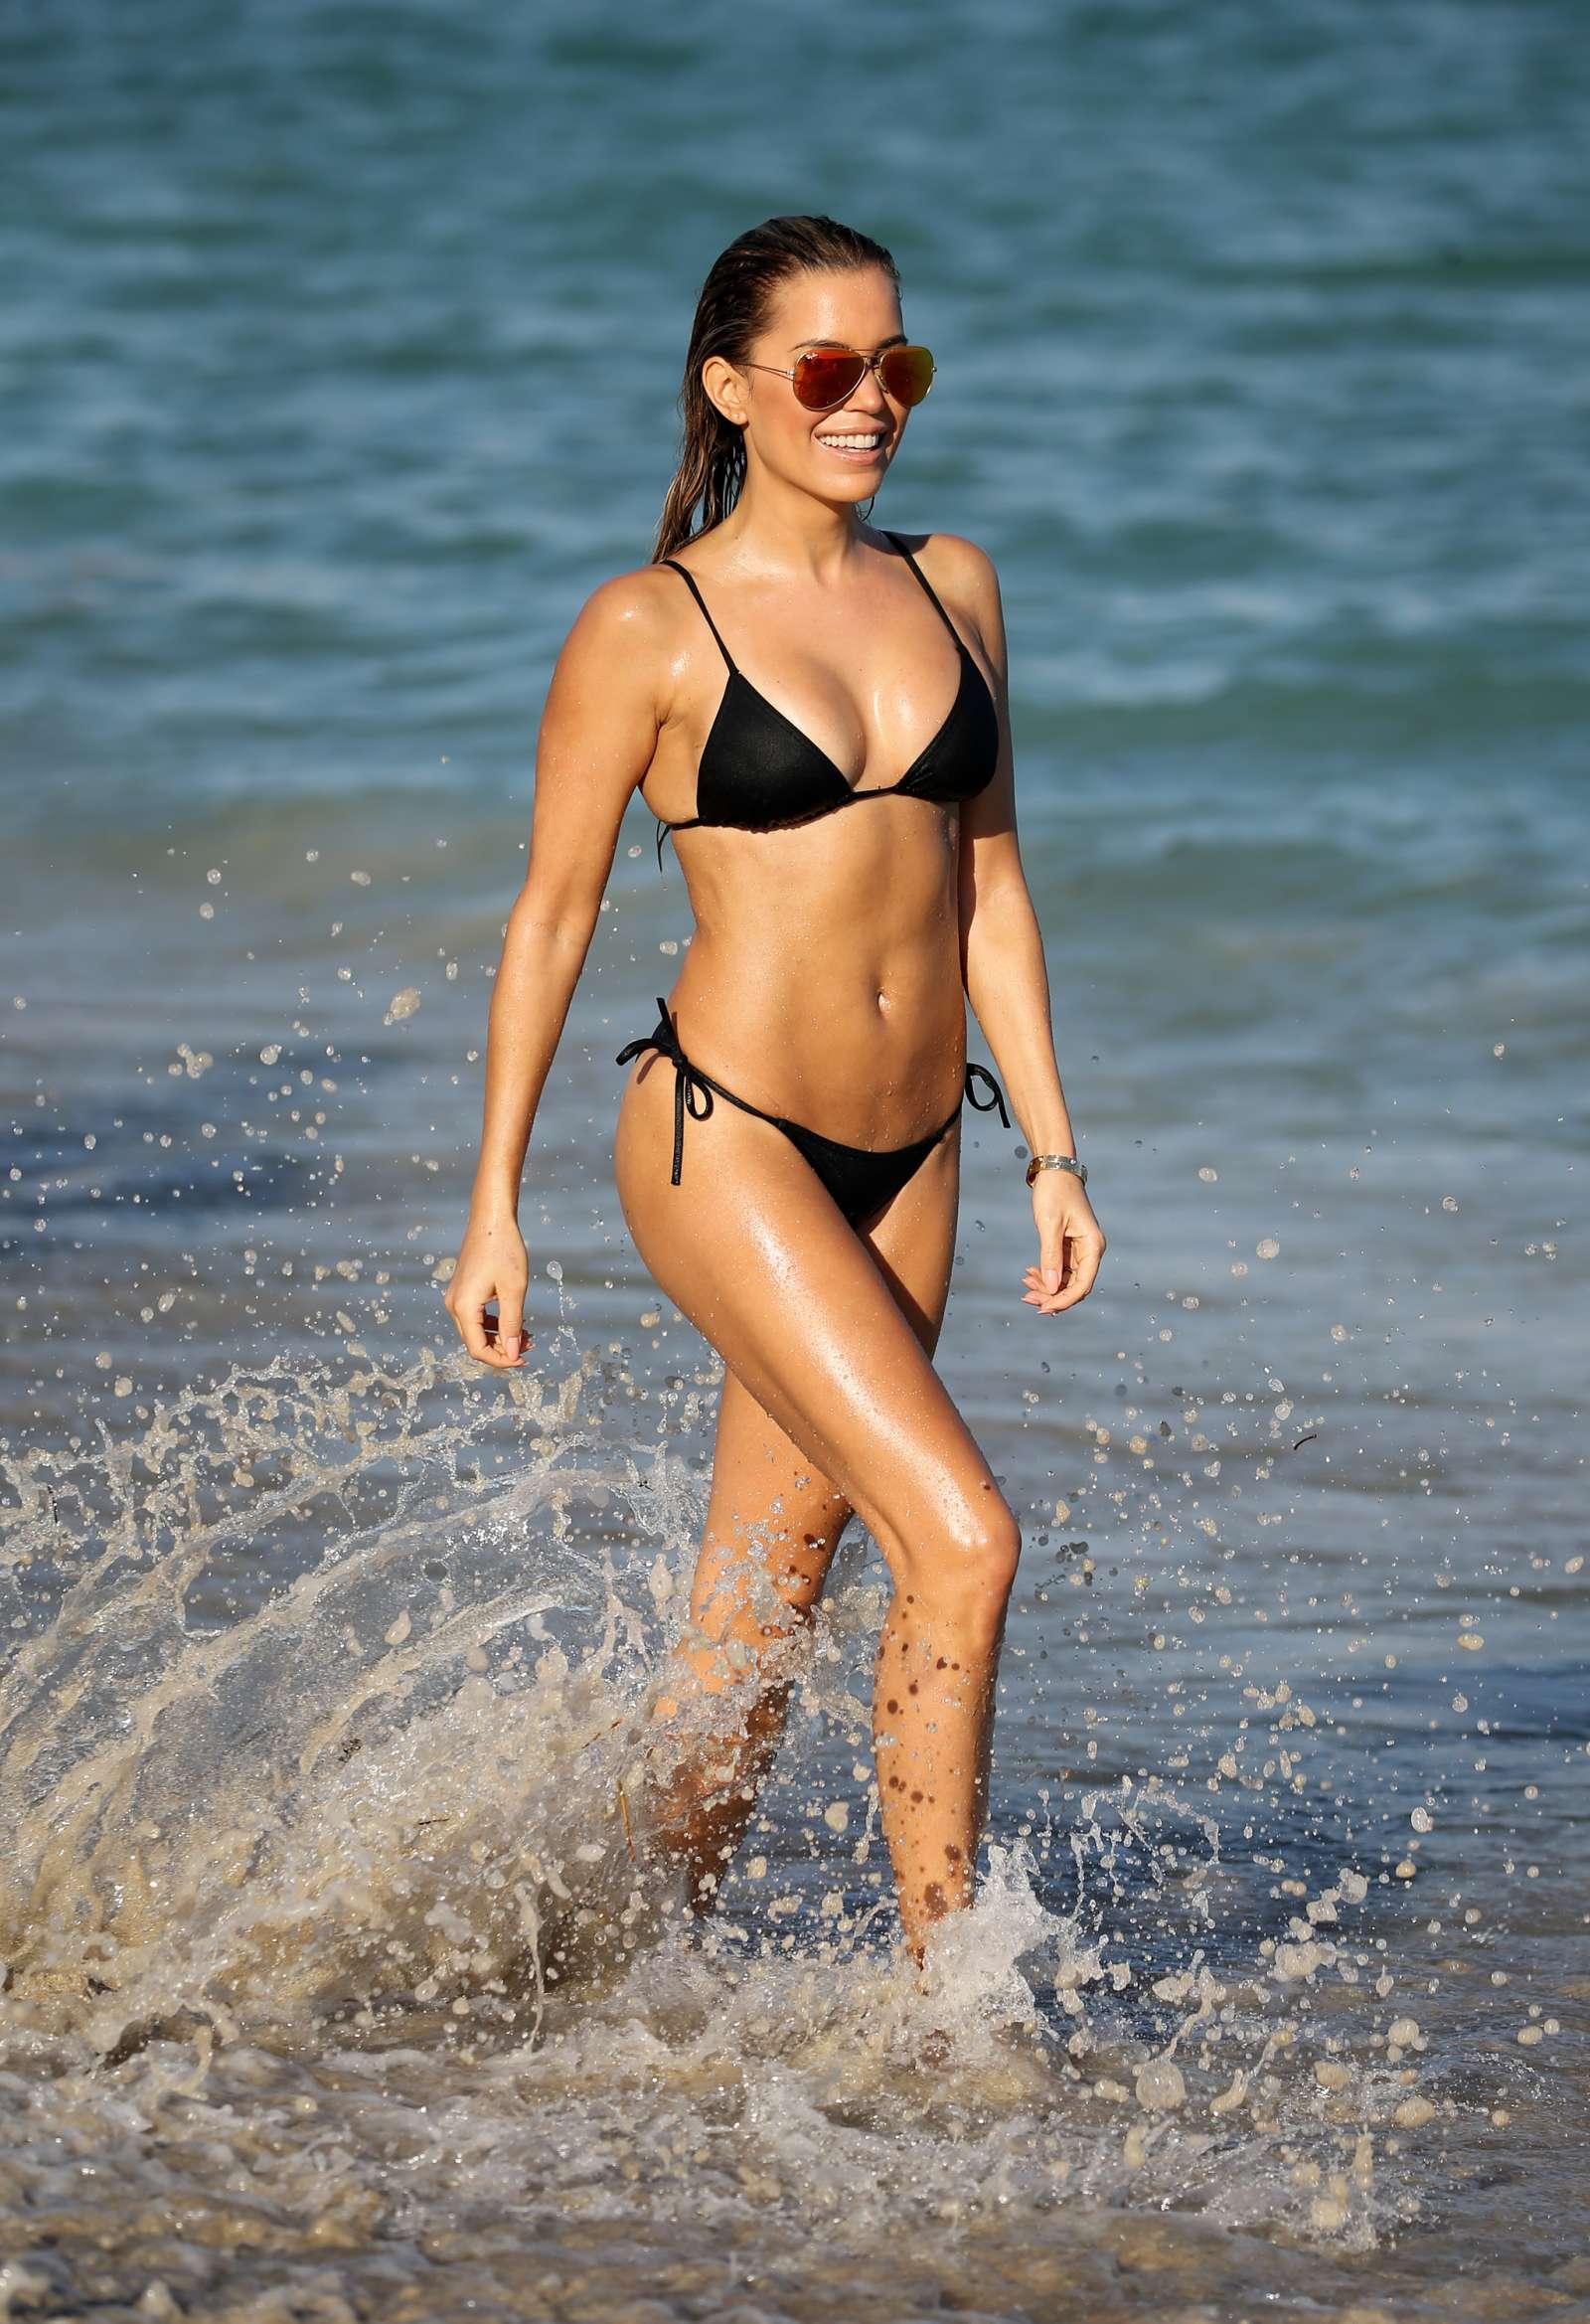 Sylvie Meis 2017 : Sylvie Meis in Black Bikini 2017 -02